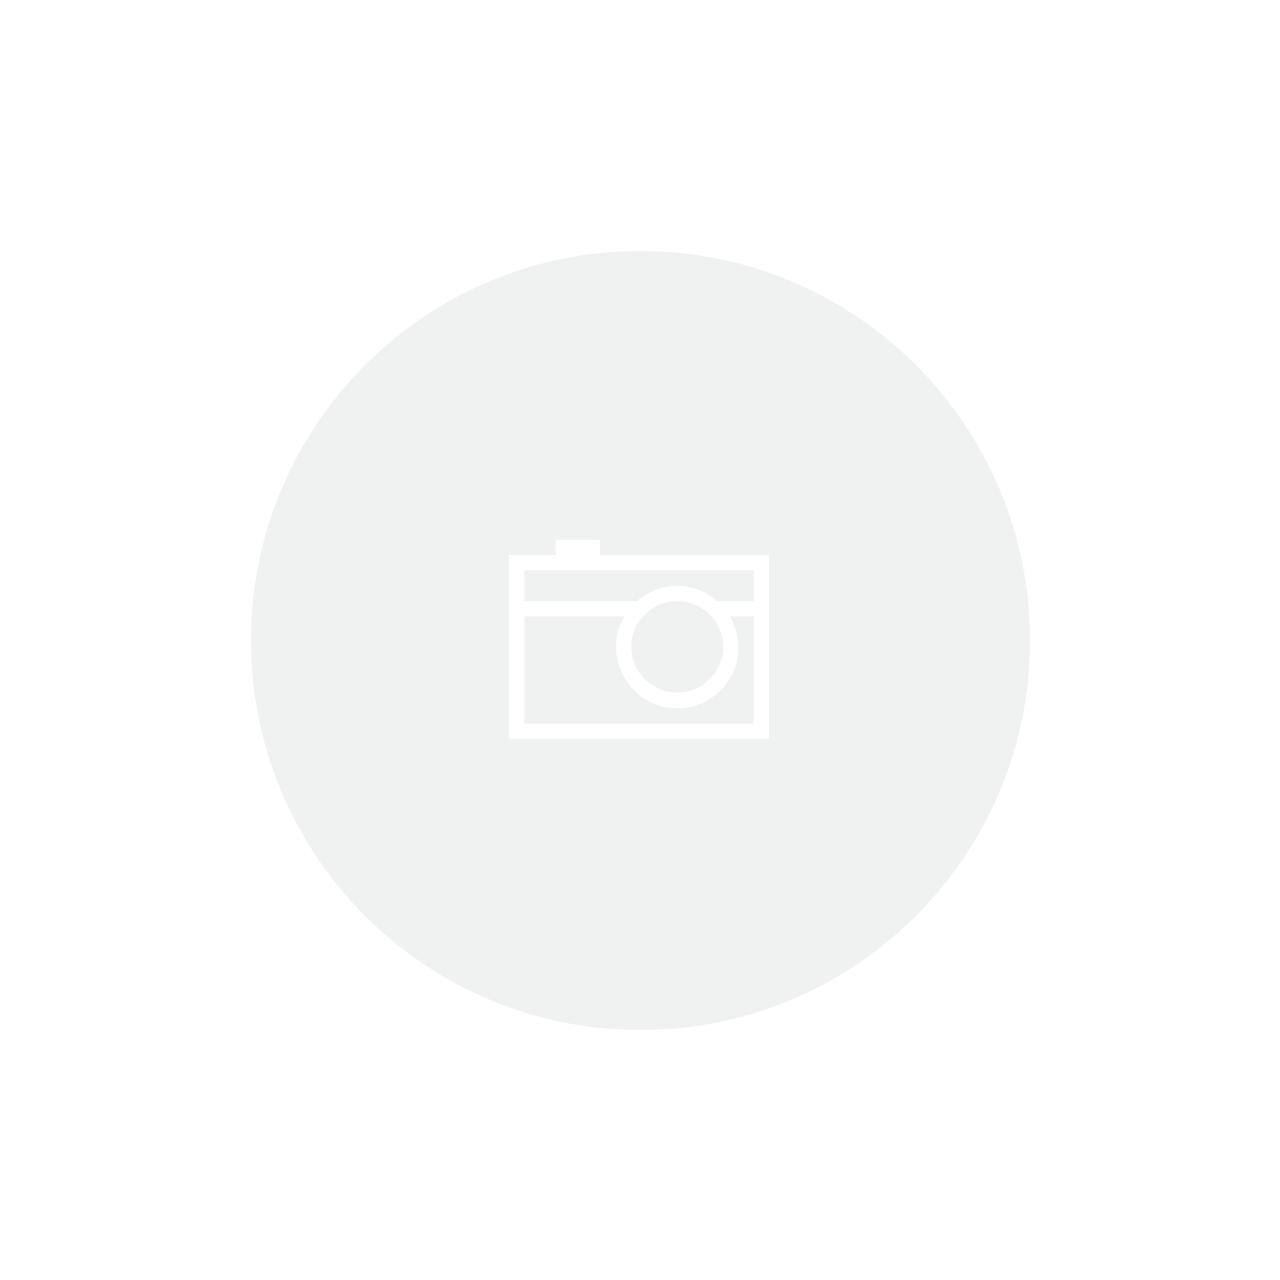 Cachepot Bege e Branco 13,5x12,5cm